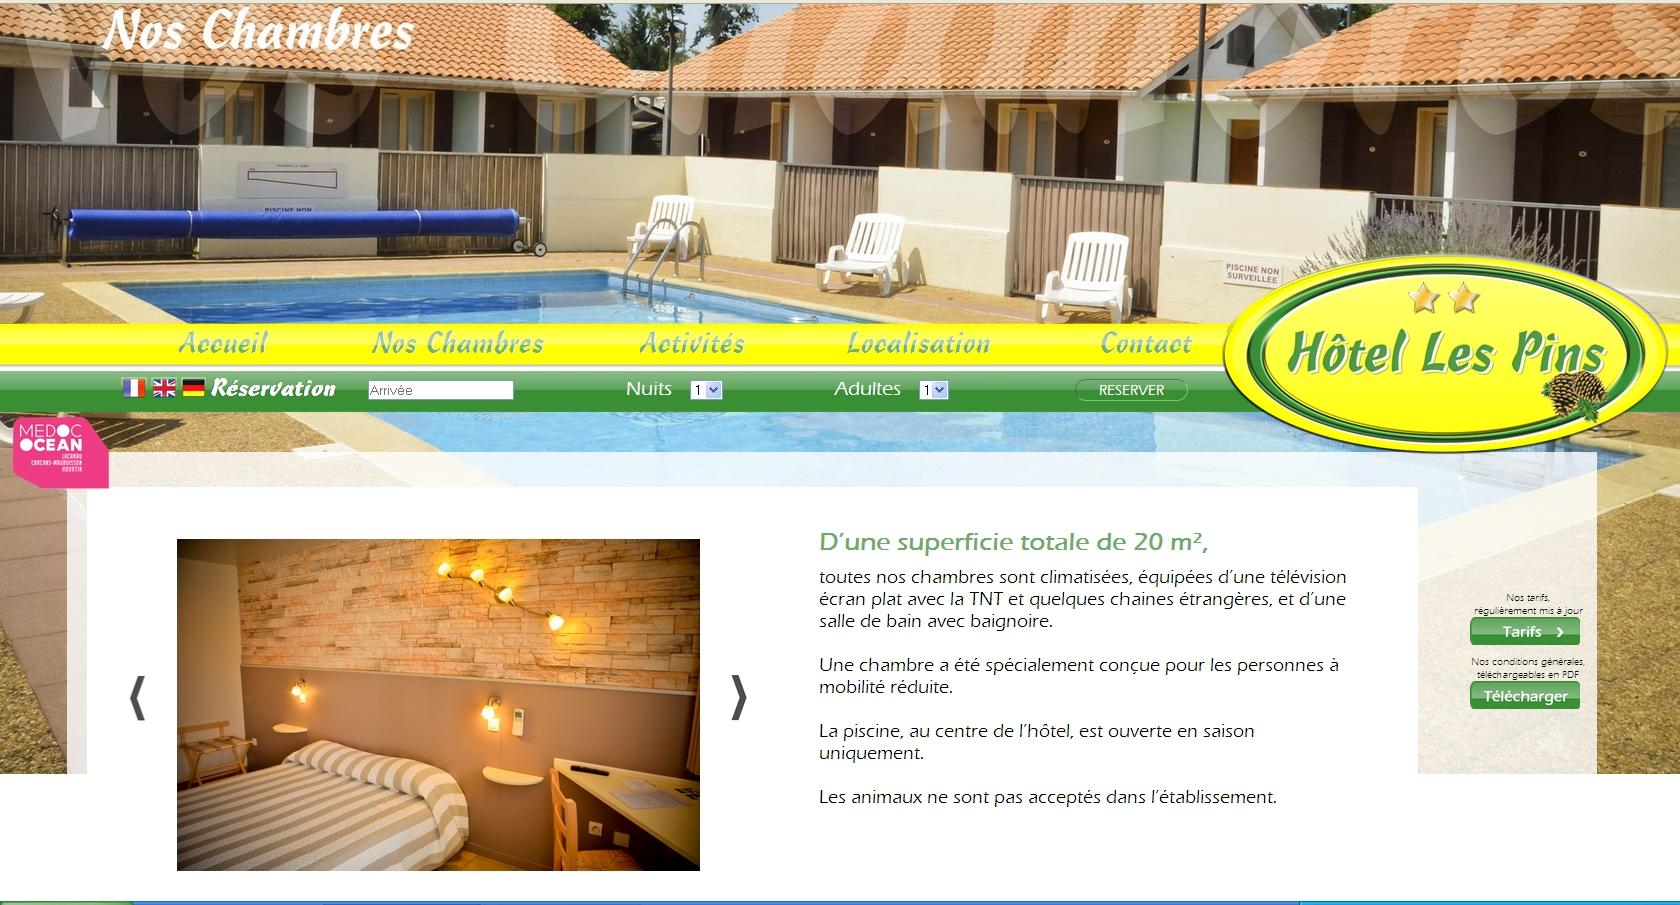 http://naytheet.fr/Web/images/reas/HtelLesPins4.jpg